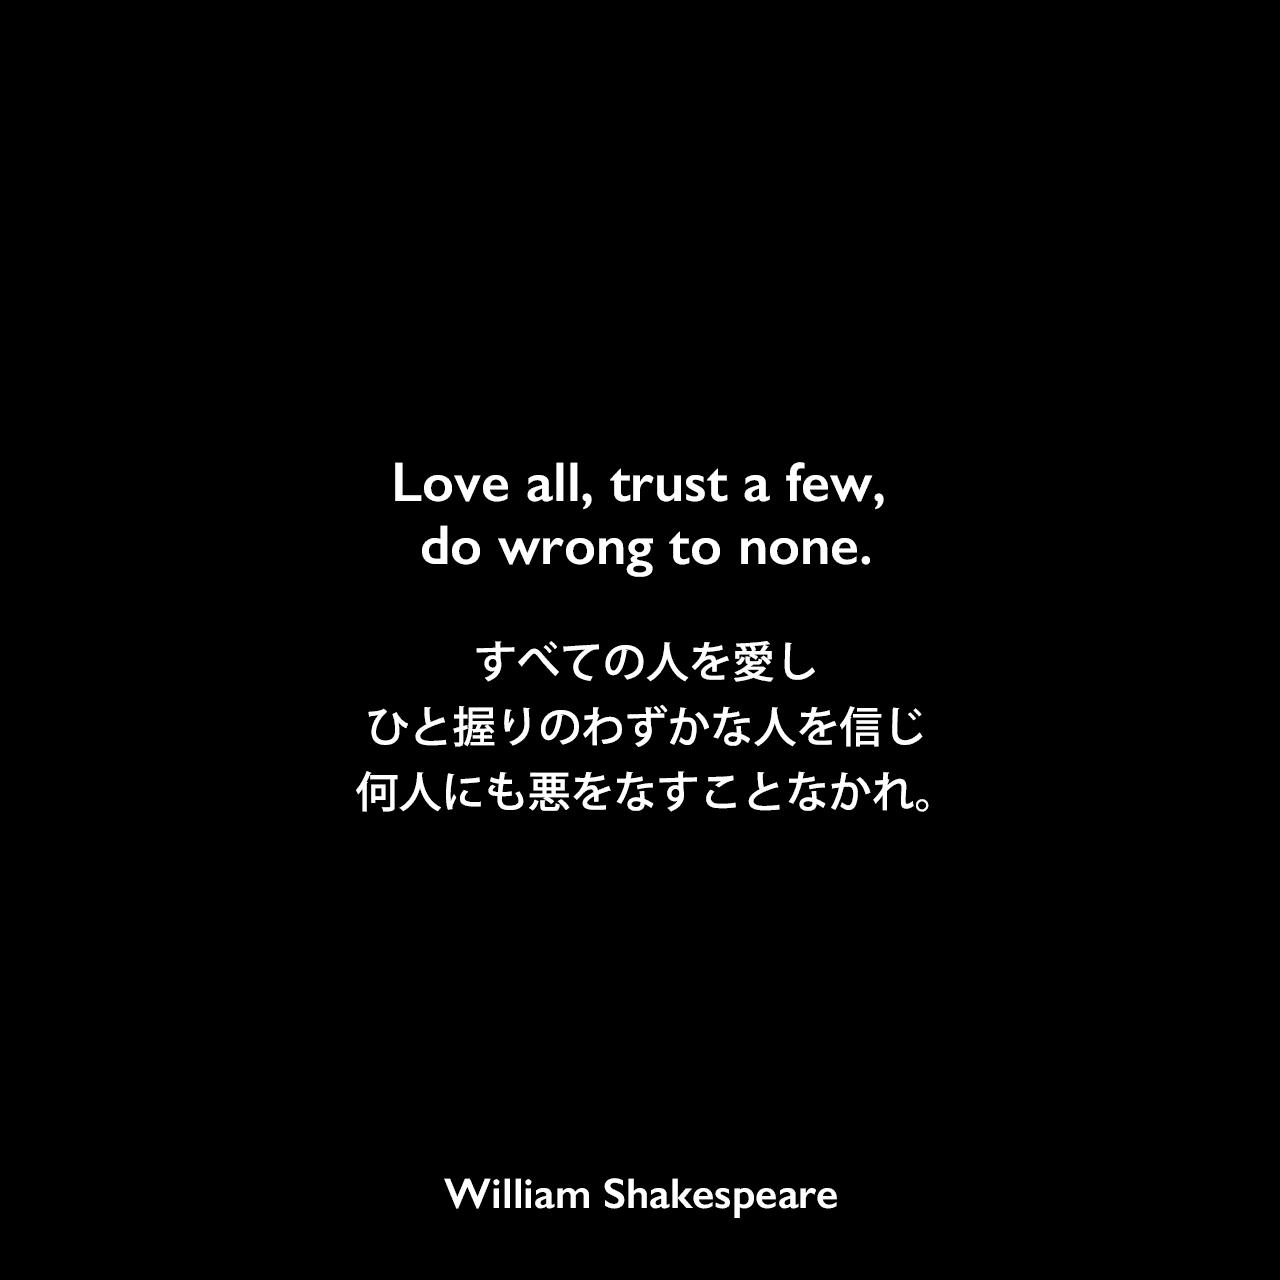 Love all, trust a few, do wrong to none.すべての人を愛し、ひと握りのわずかな人を信じ、何人にも悪をなすことなかれ。William Shakespeare